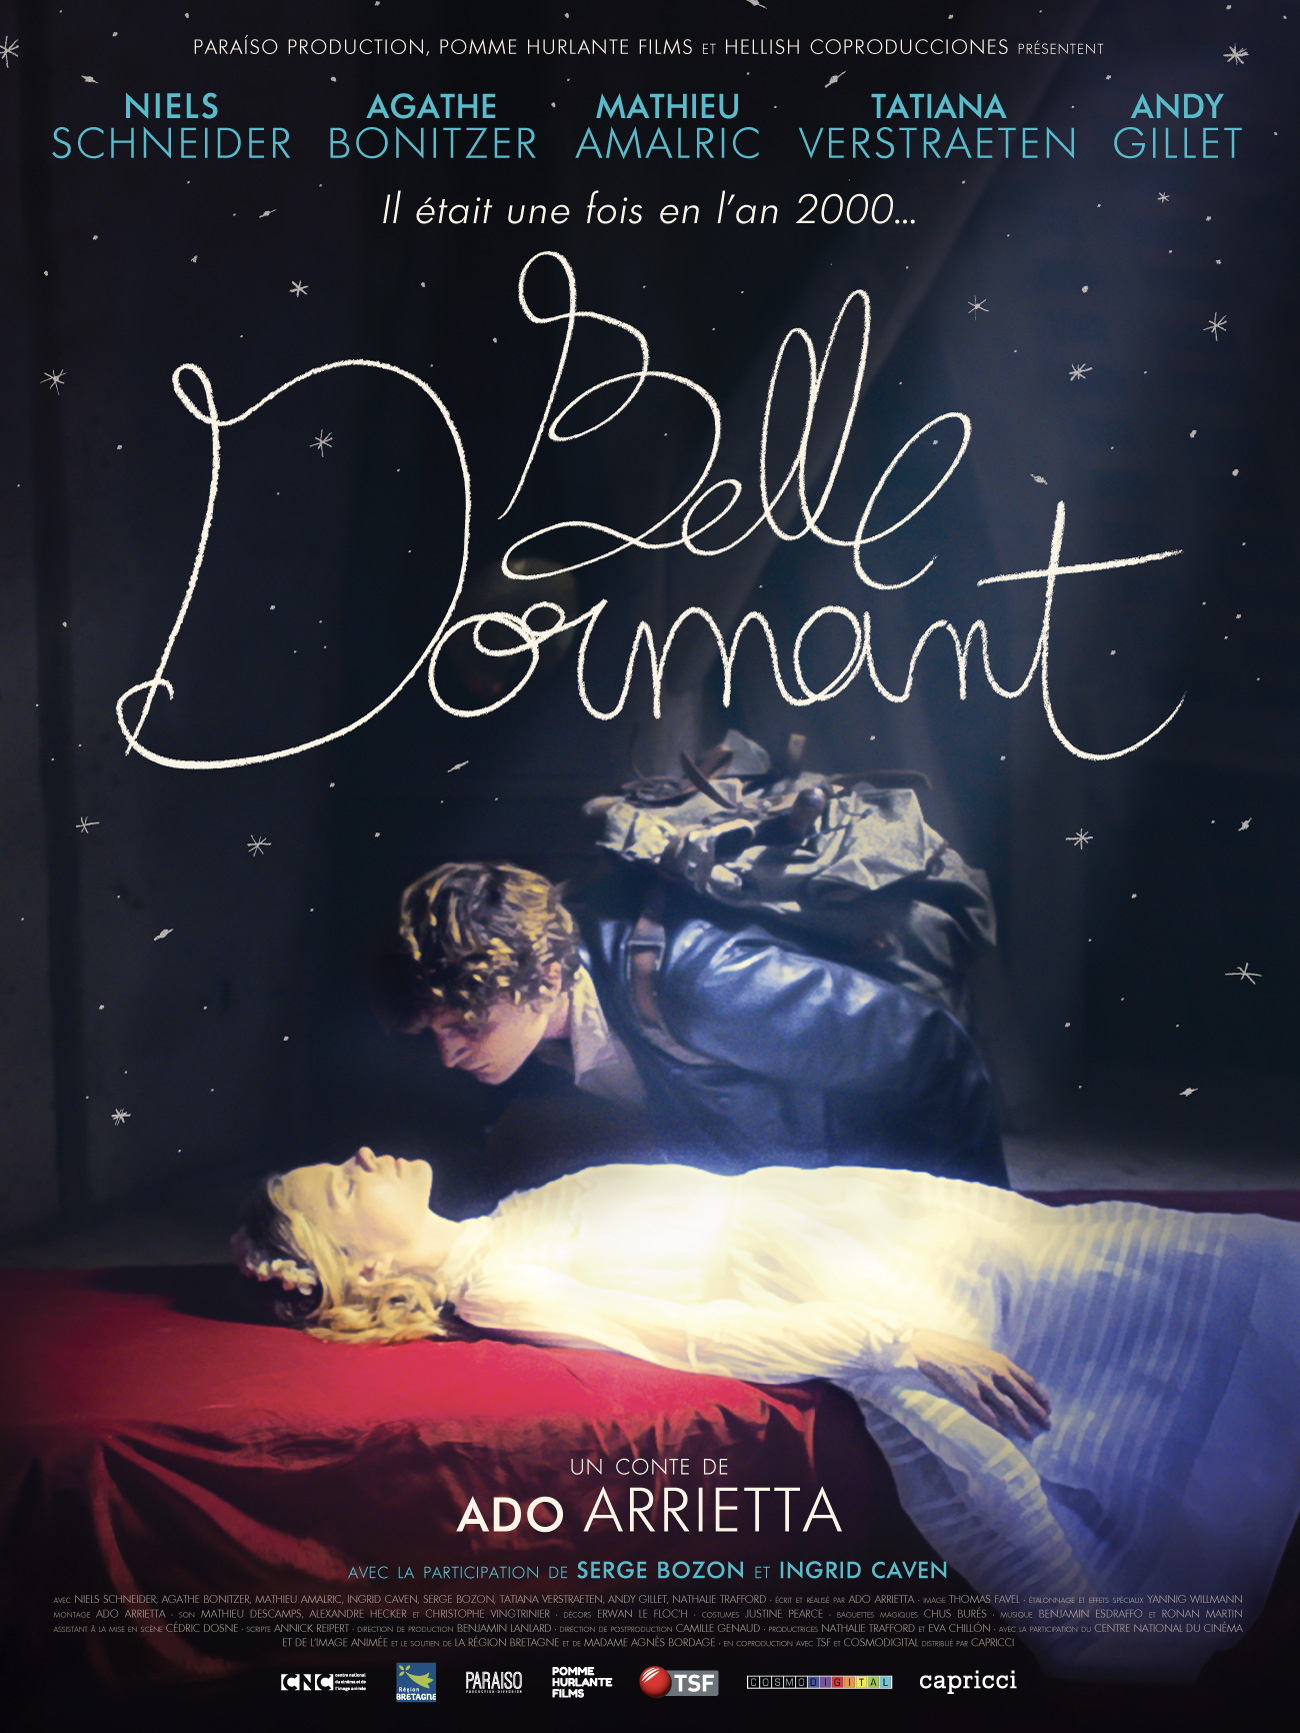 Pomme Hurlante Films - Catalog - Sleeping Beauty - Adolfo Arrieta